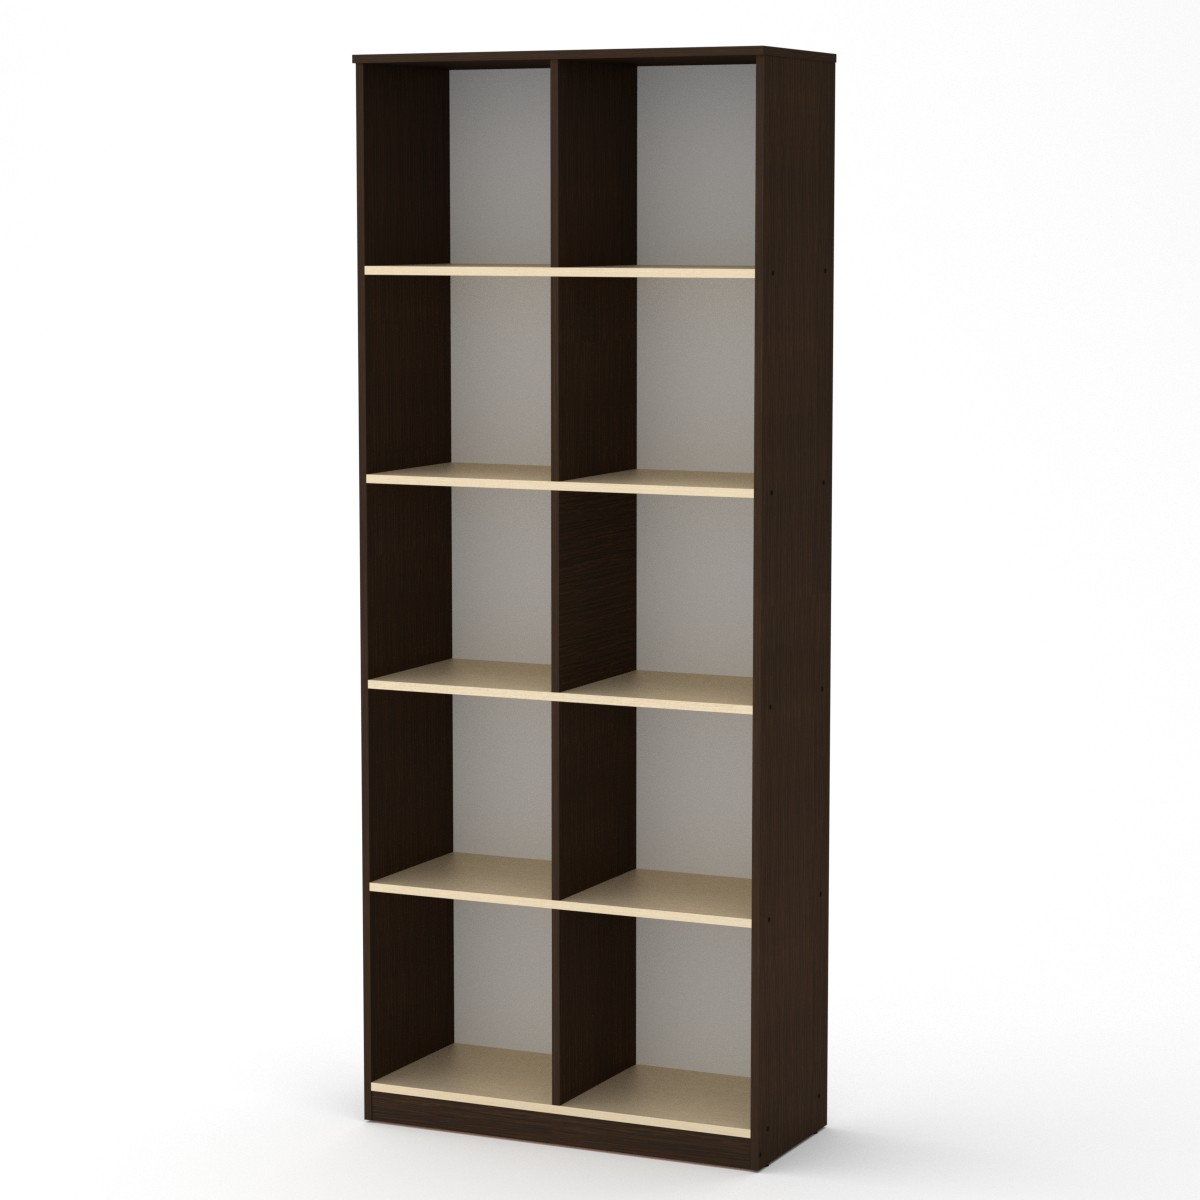 Шкаф книжный КШ-2, цвет венге комбин